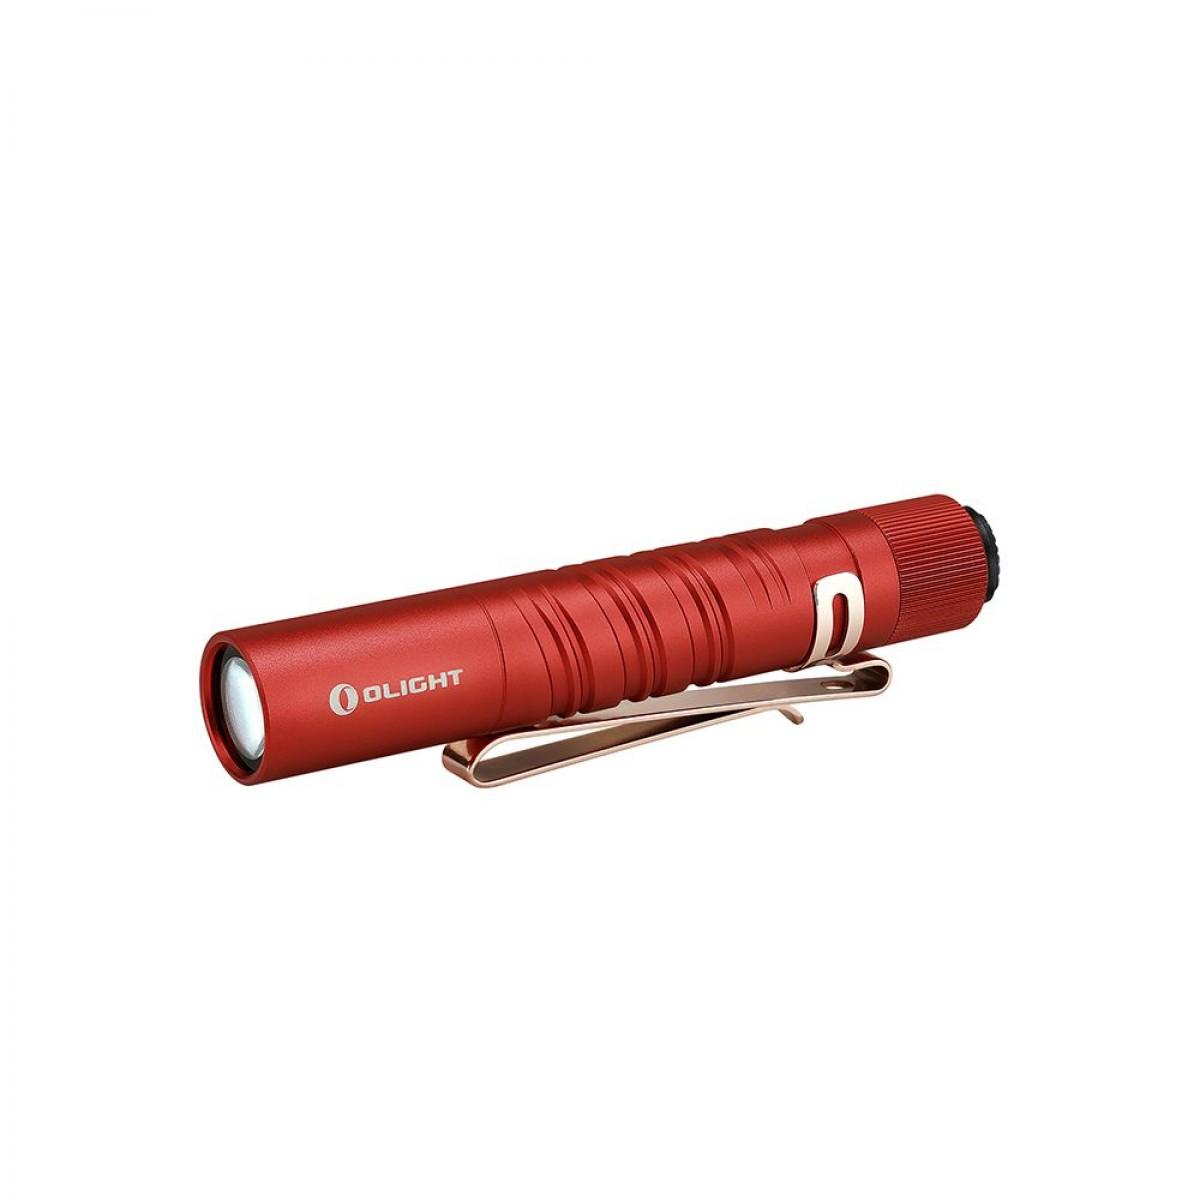 Olight I3T EOS Red Dual-Output Luxeon TX CW LED 180L Flashlight